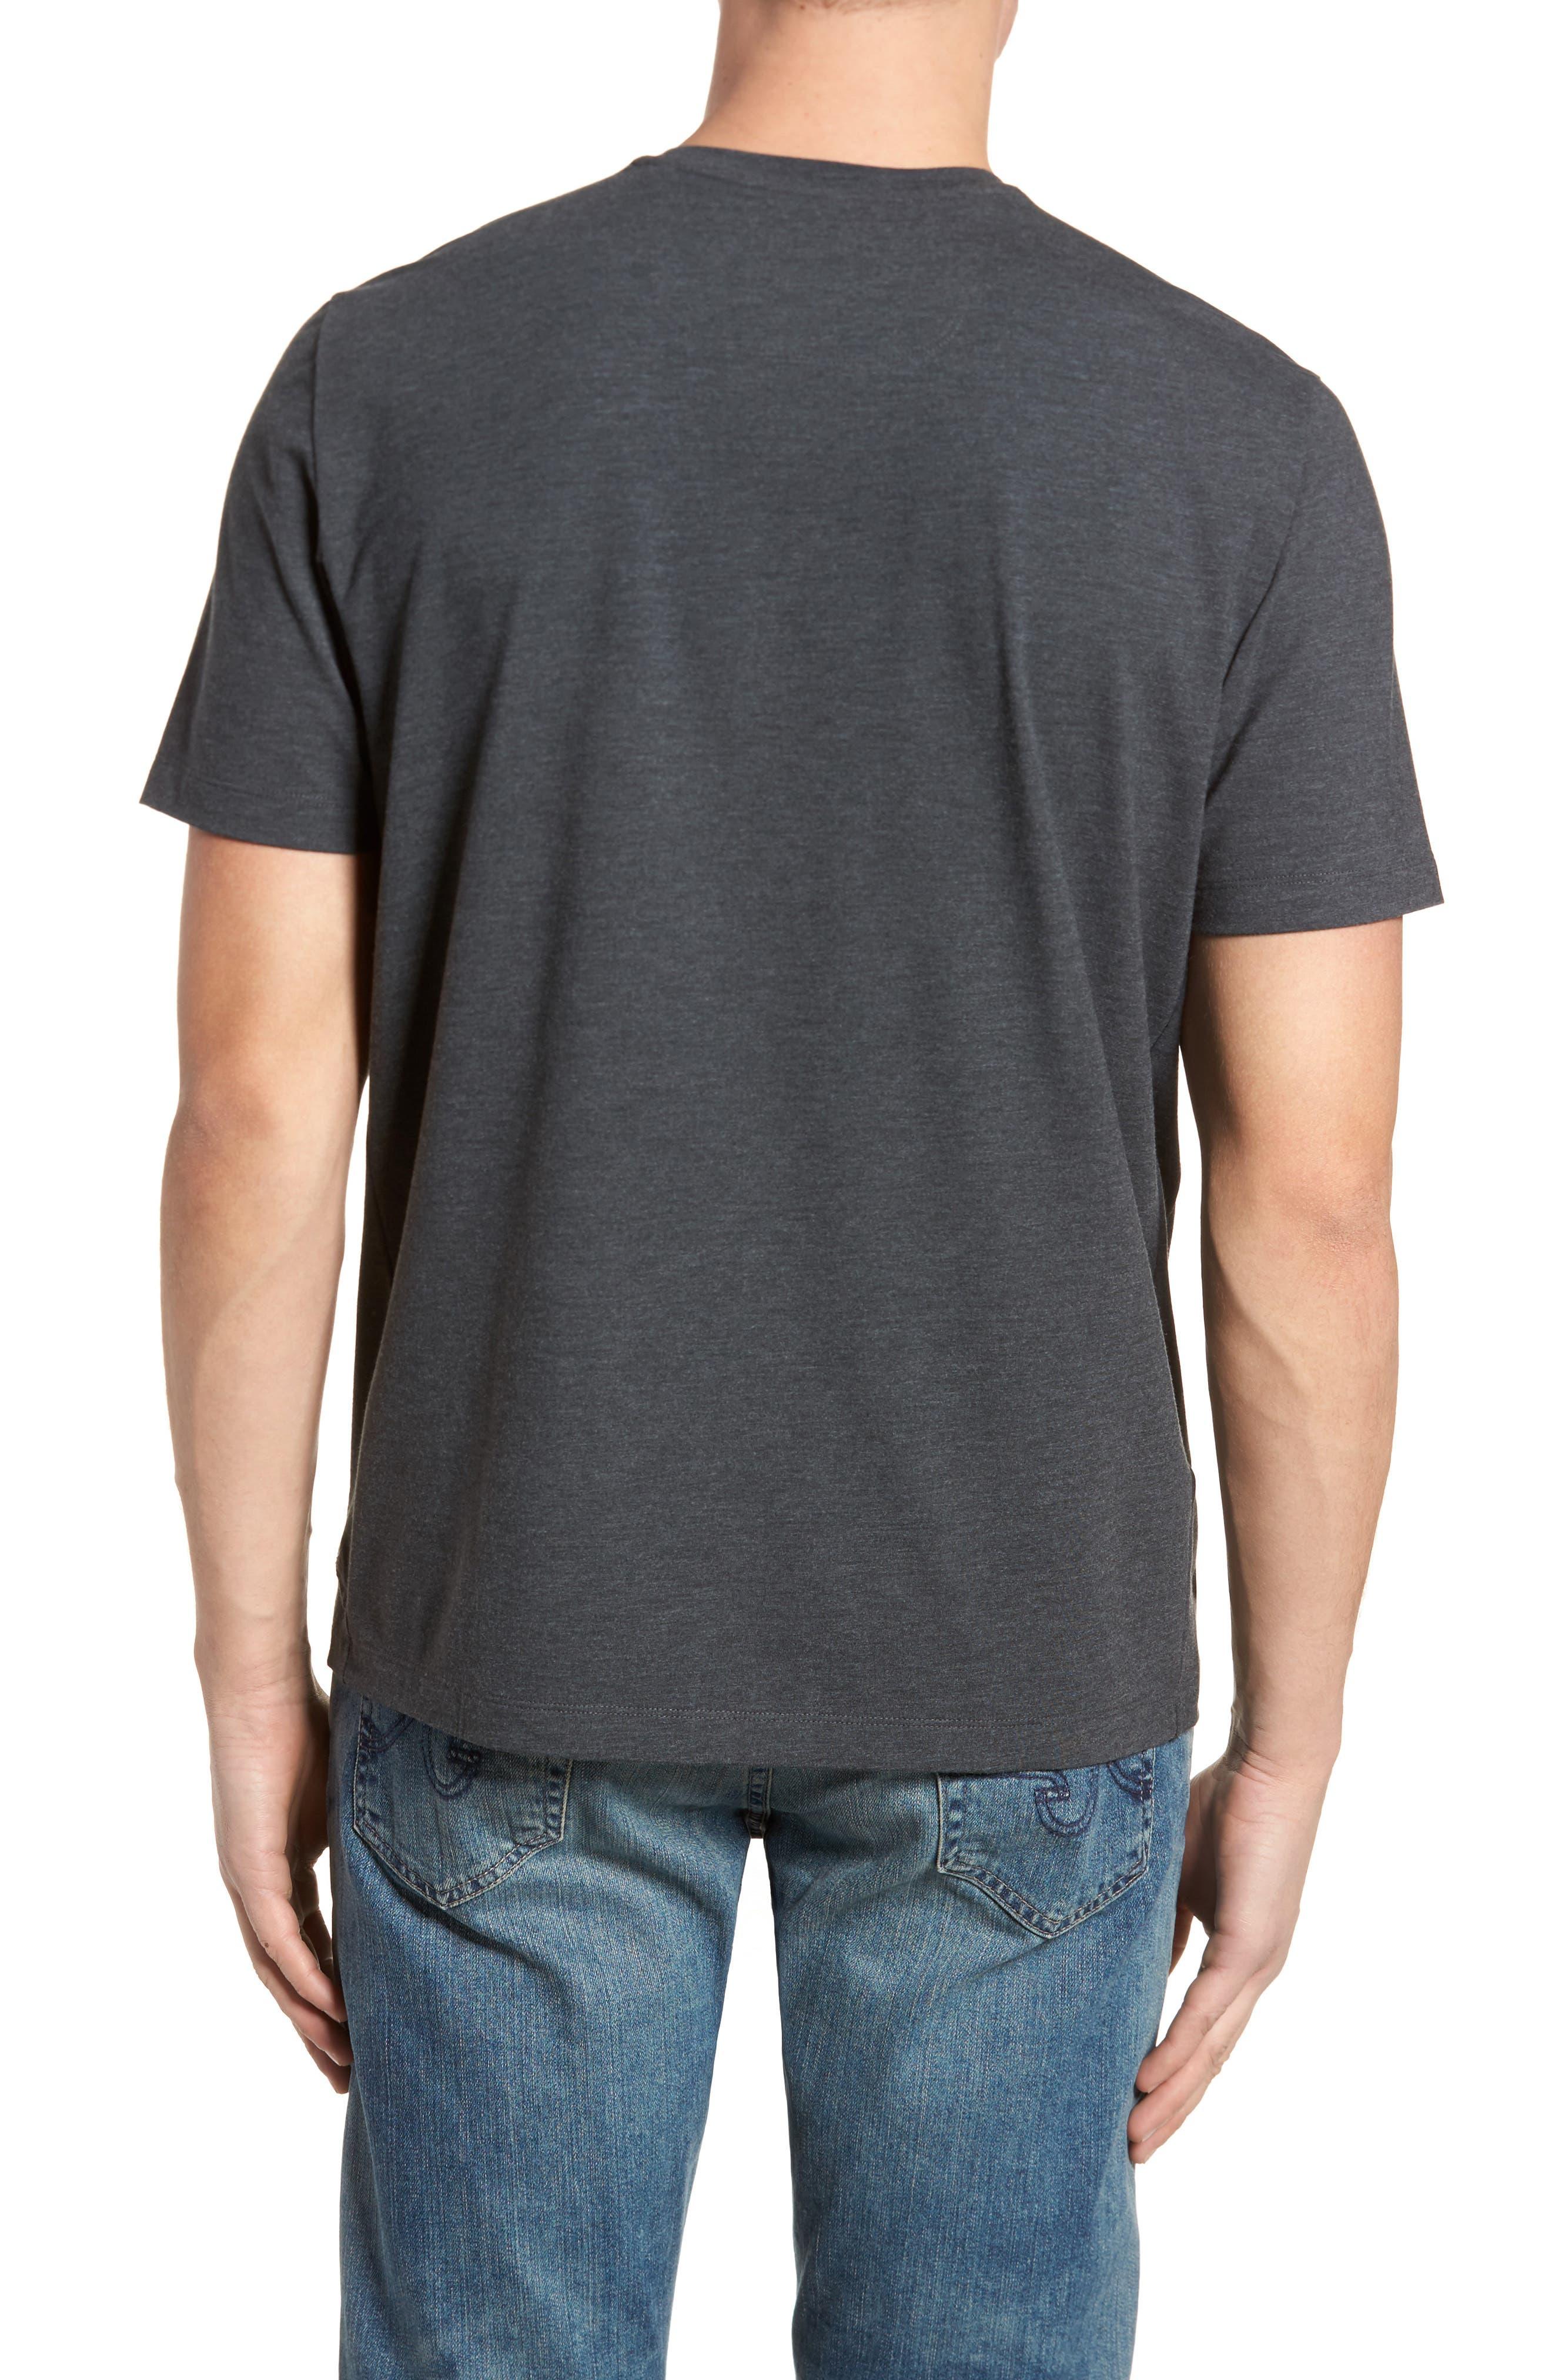 Tropicool T-Shirt,                             Alternate thumbnail 13, color,